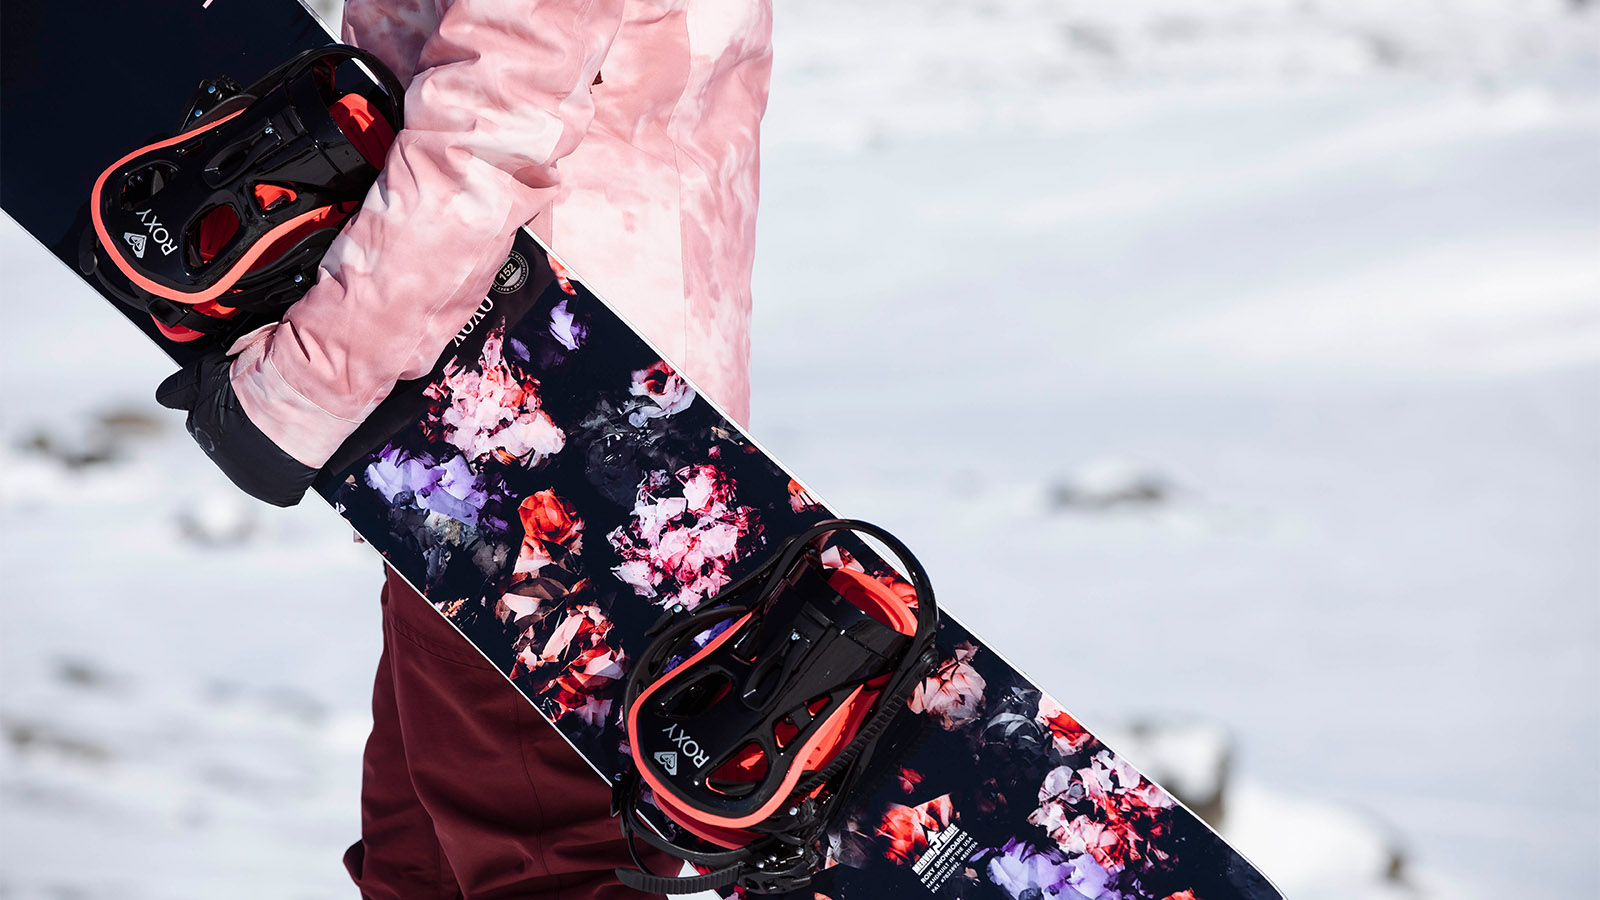 Roxy FW20/21 Snowboard Bindings